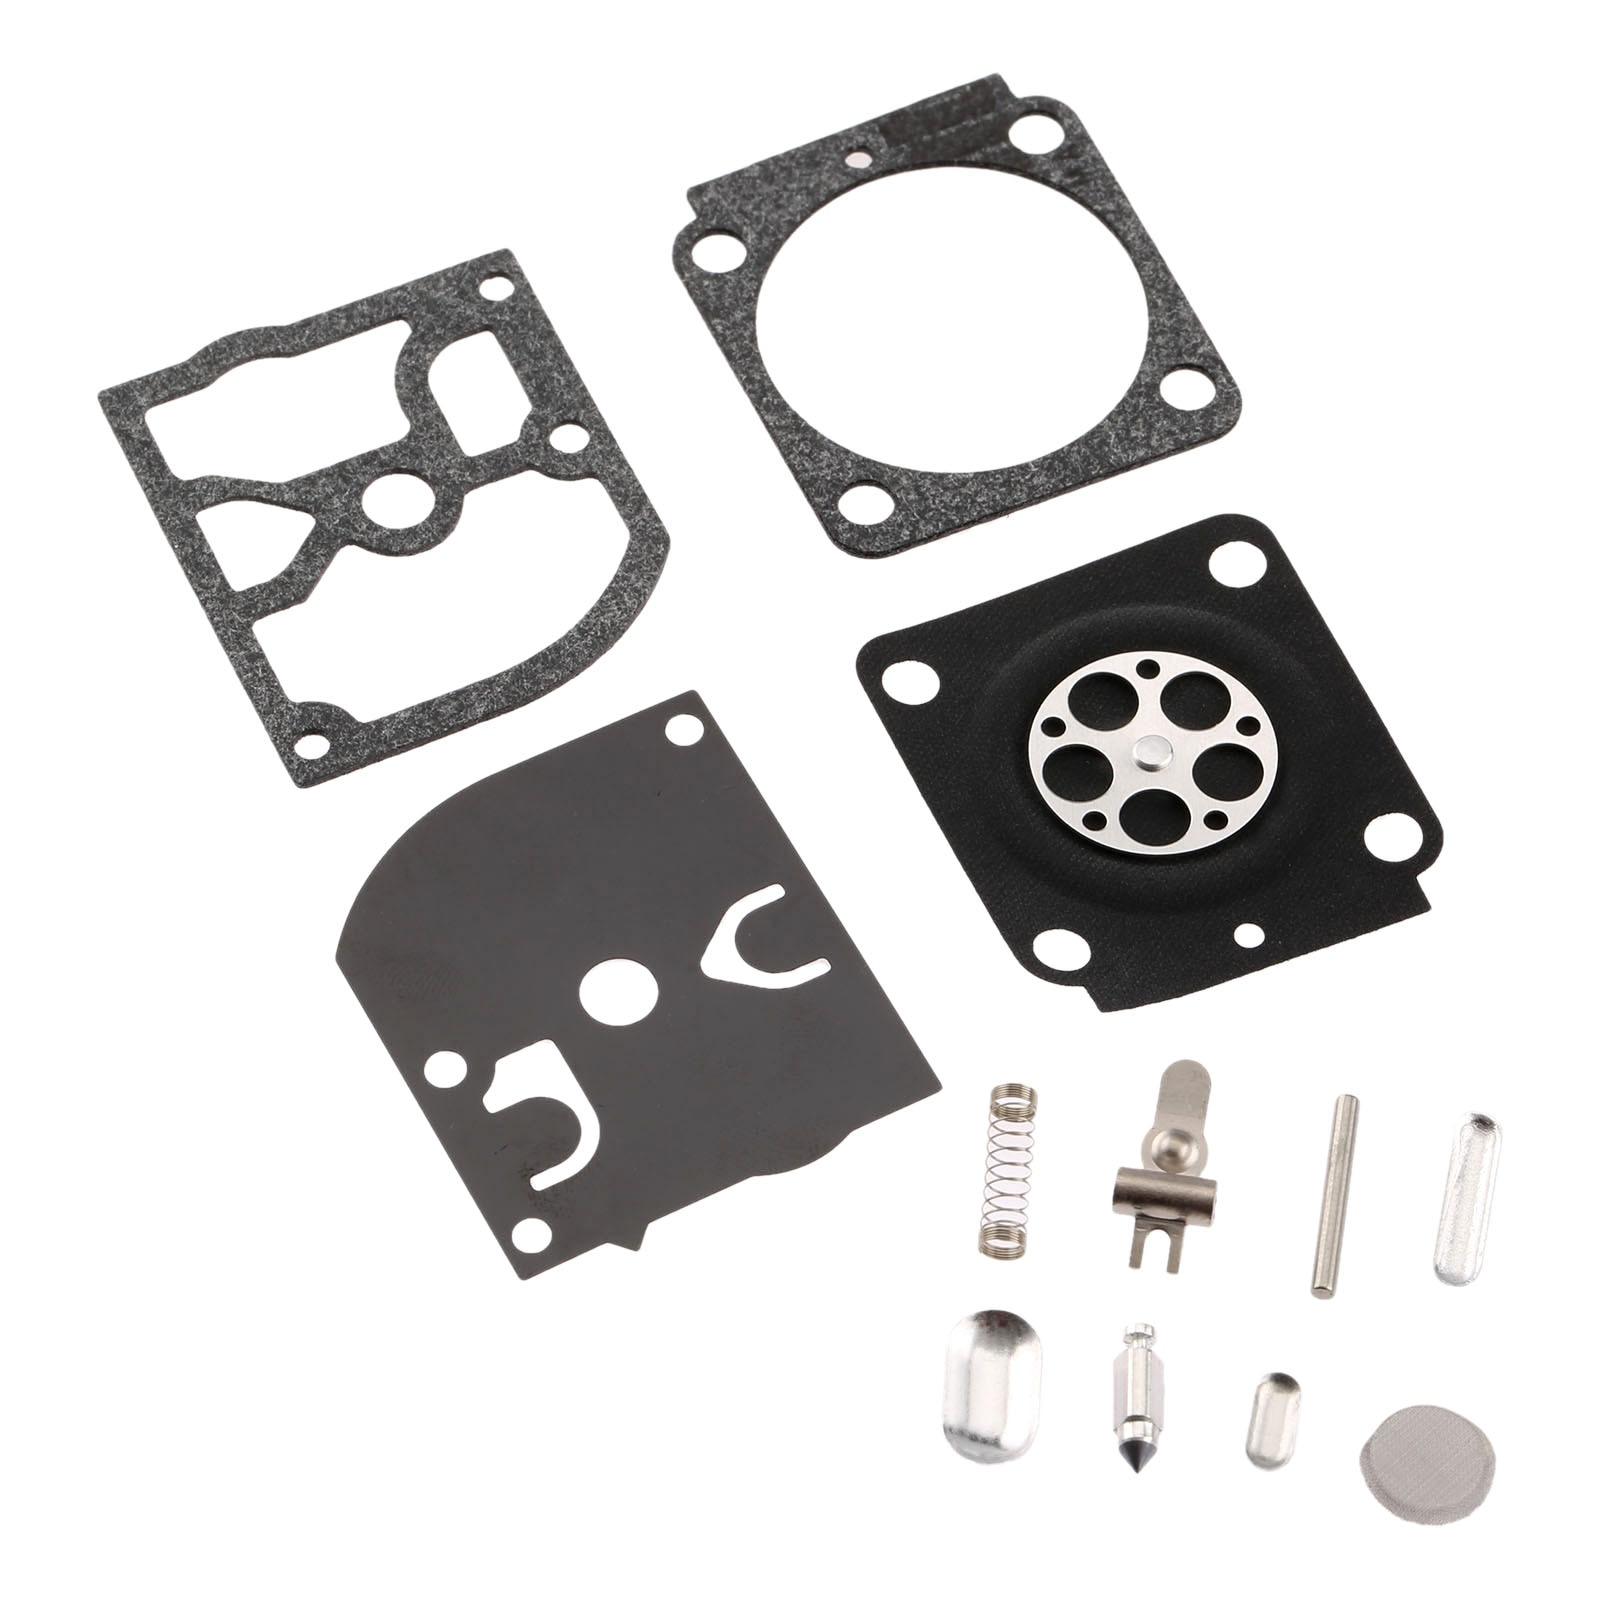 stihl chainsaw parts бесплатная доставка